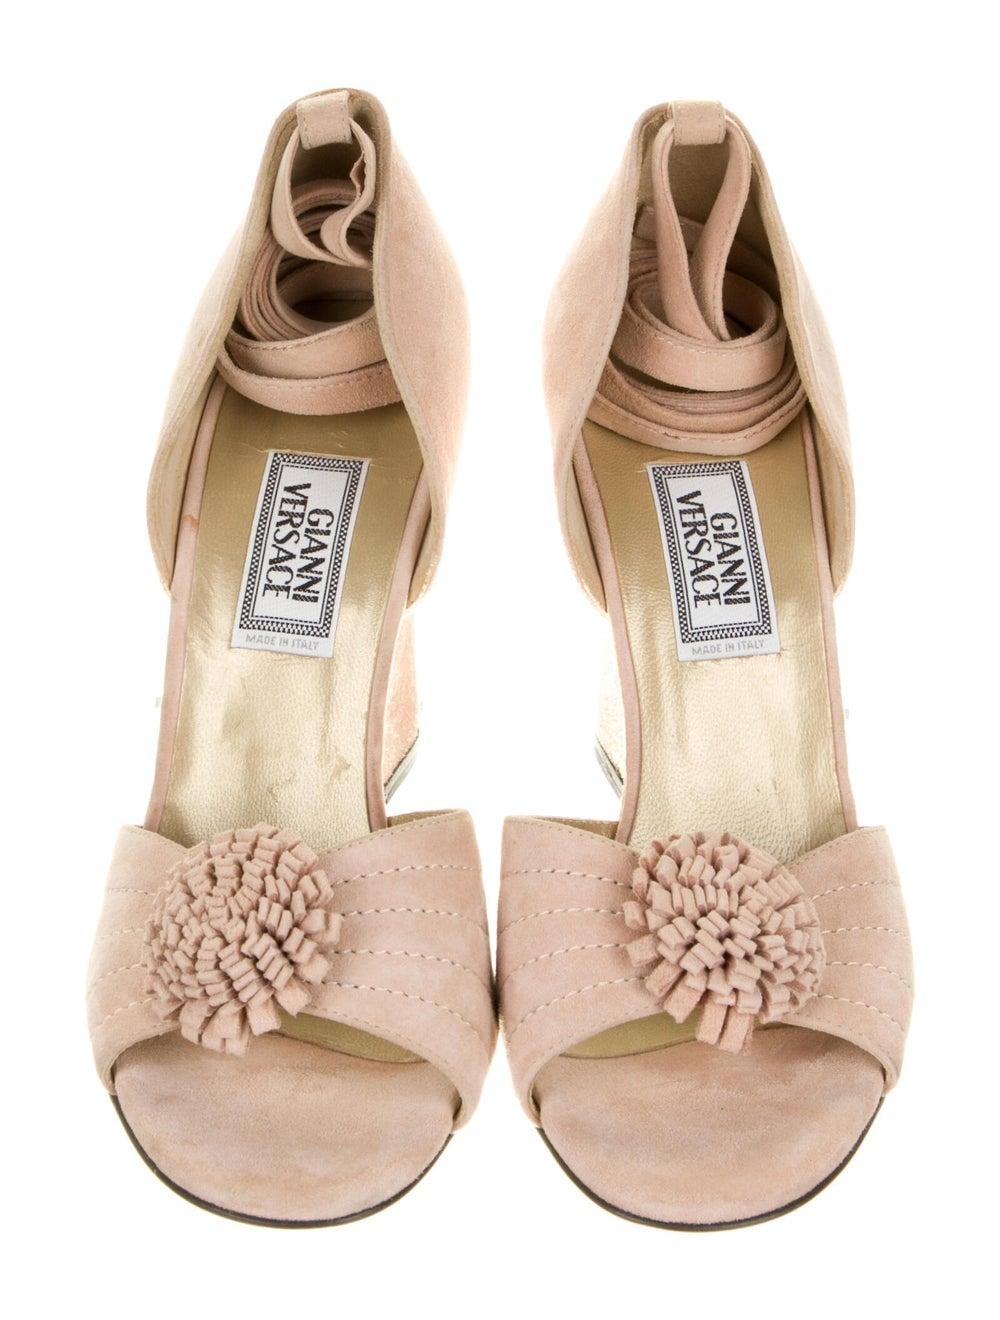 Gianni Versace Vintage Suede Sandals - image 3